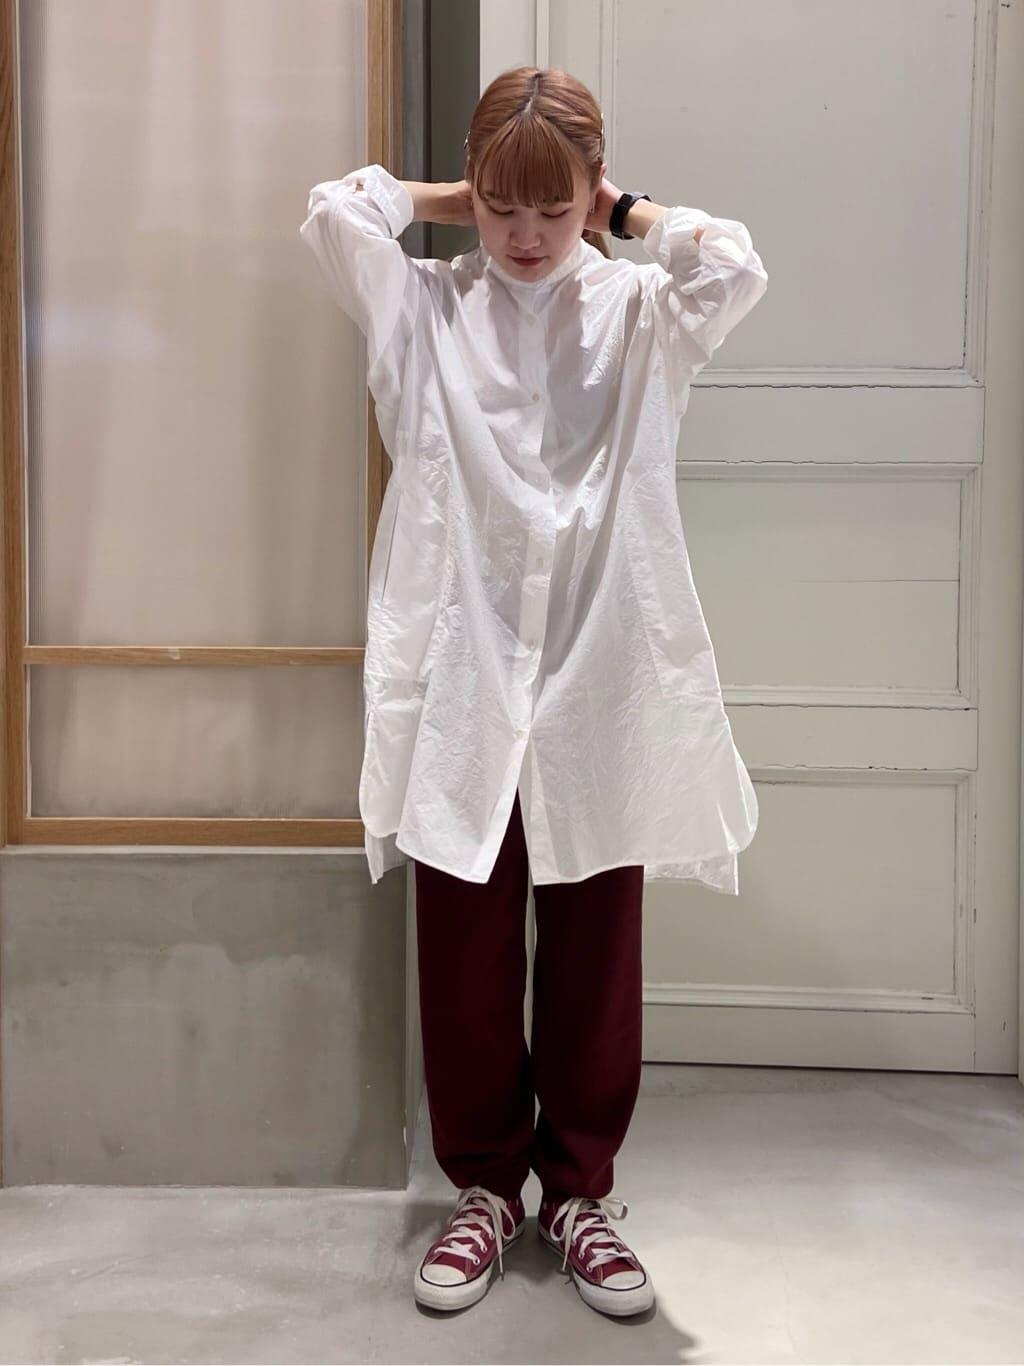 bulle de savon 渋谷スクランブルスクエア 身長:160cm 2021.09.16